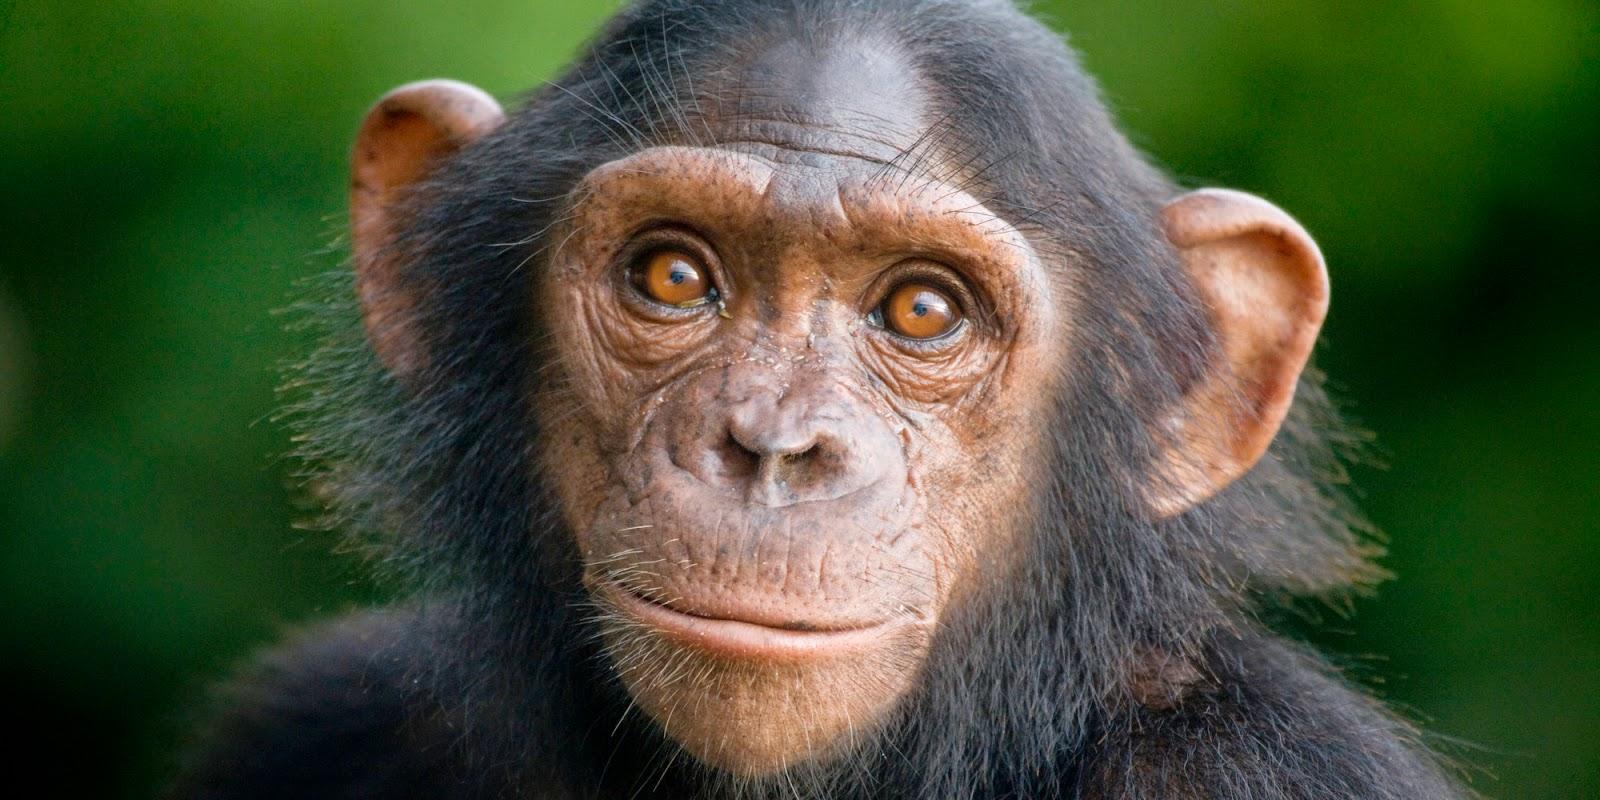 Mirada antropológica. Chimpanc%C3%A9